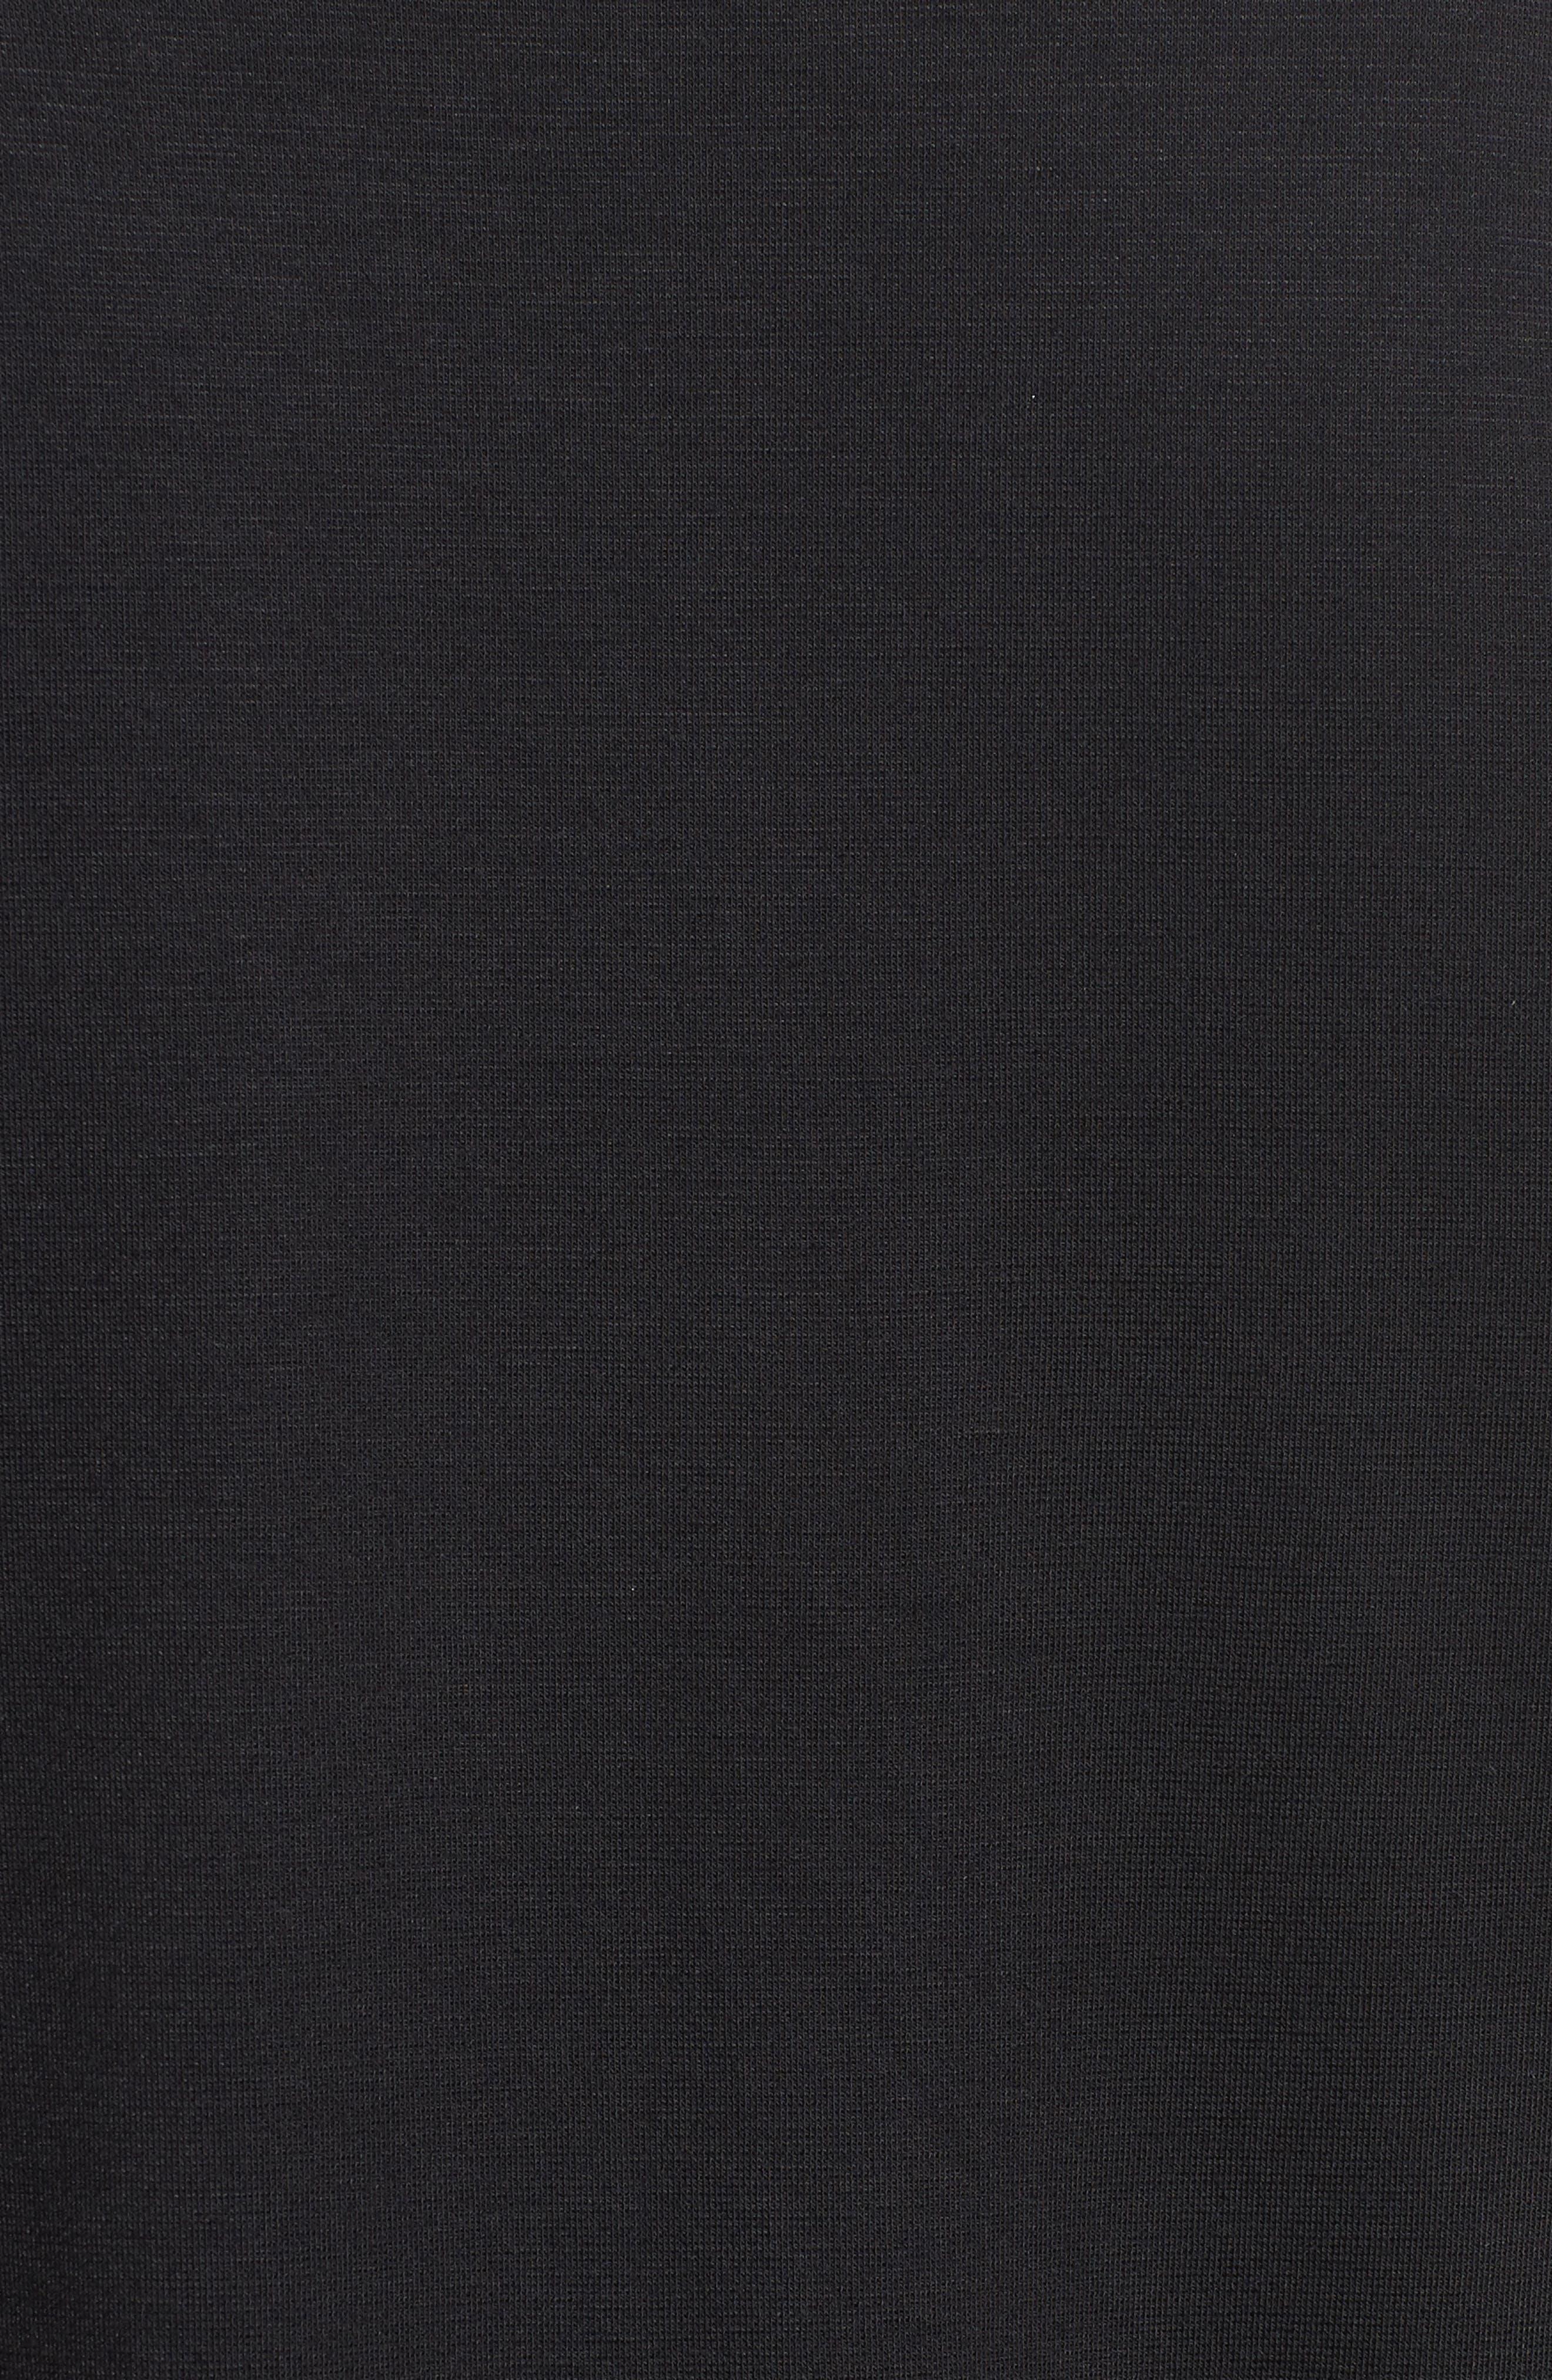 Bell Sleeve Handkerchief Ruffle Top,                             Alternate thumbnail 5, color,                             001